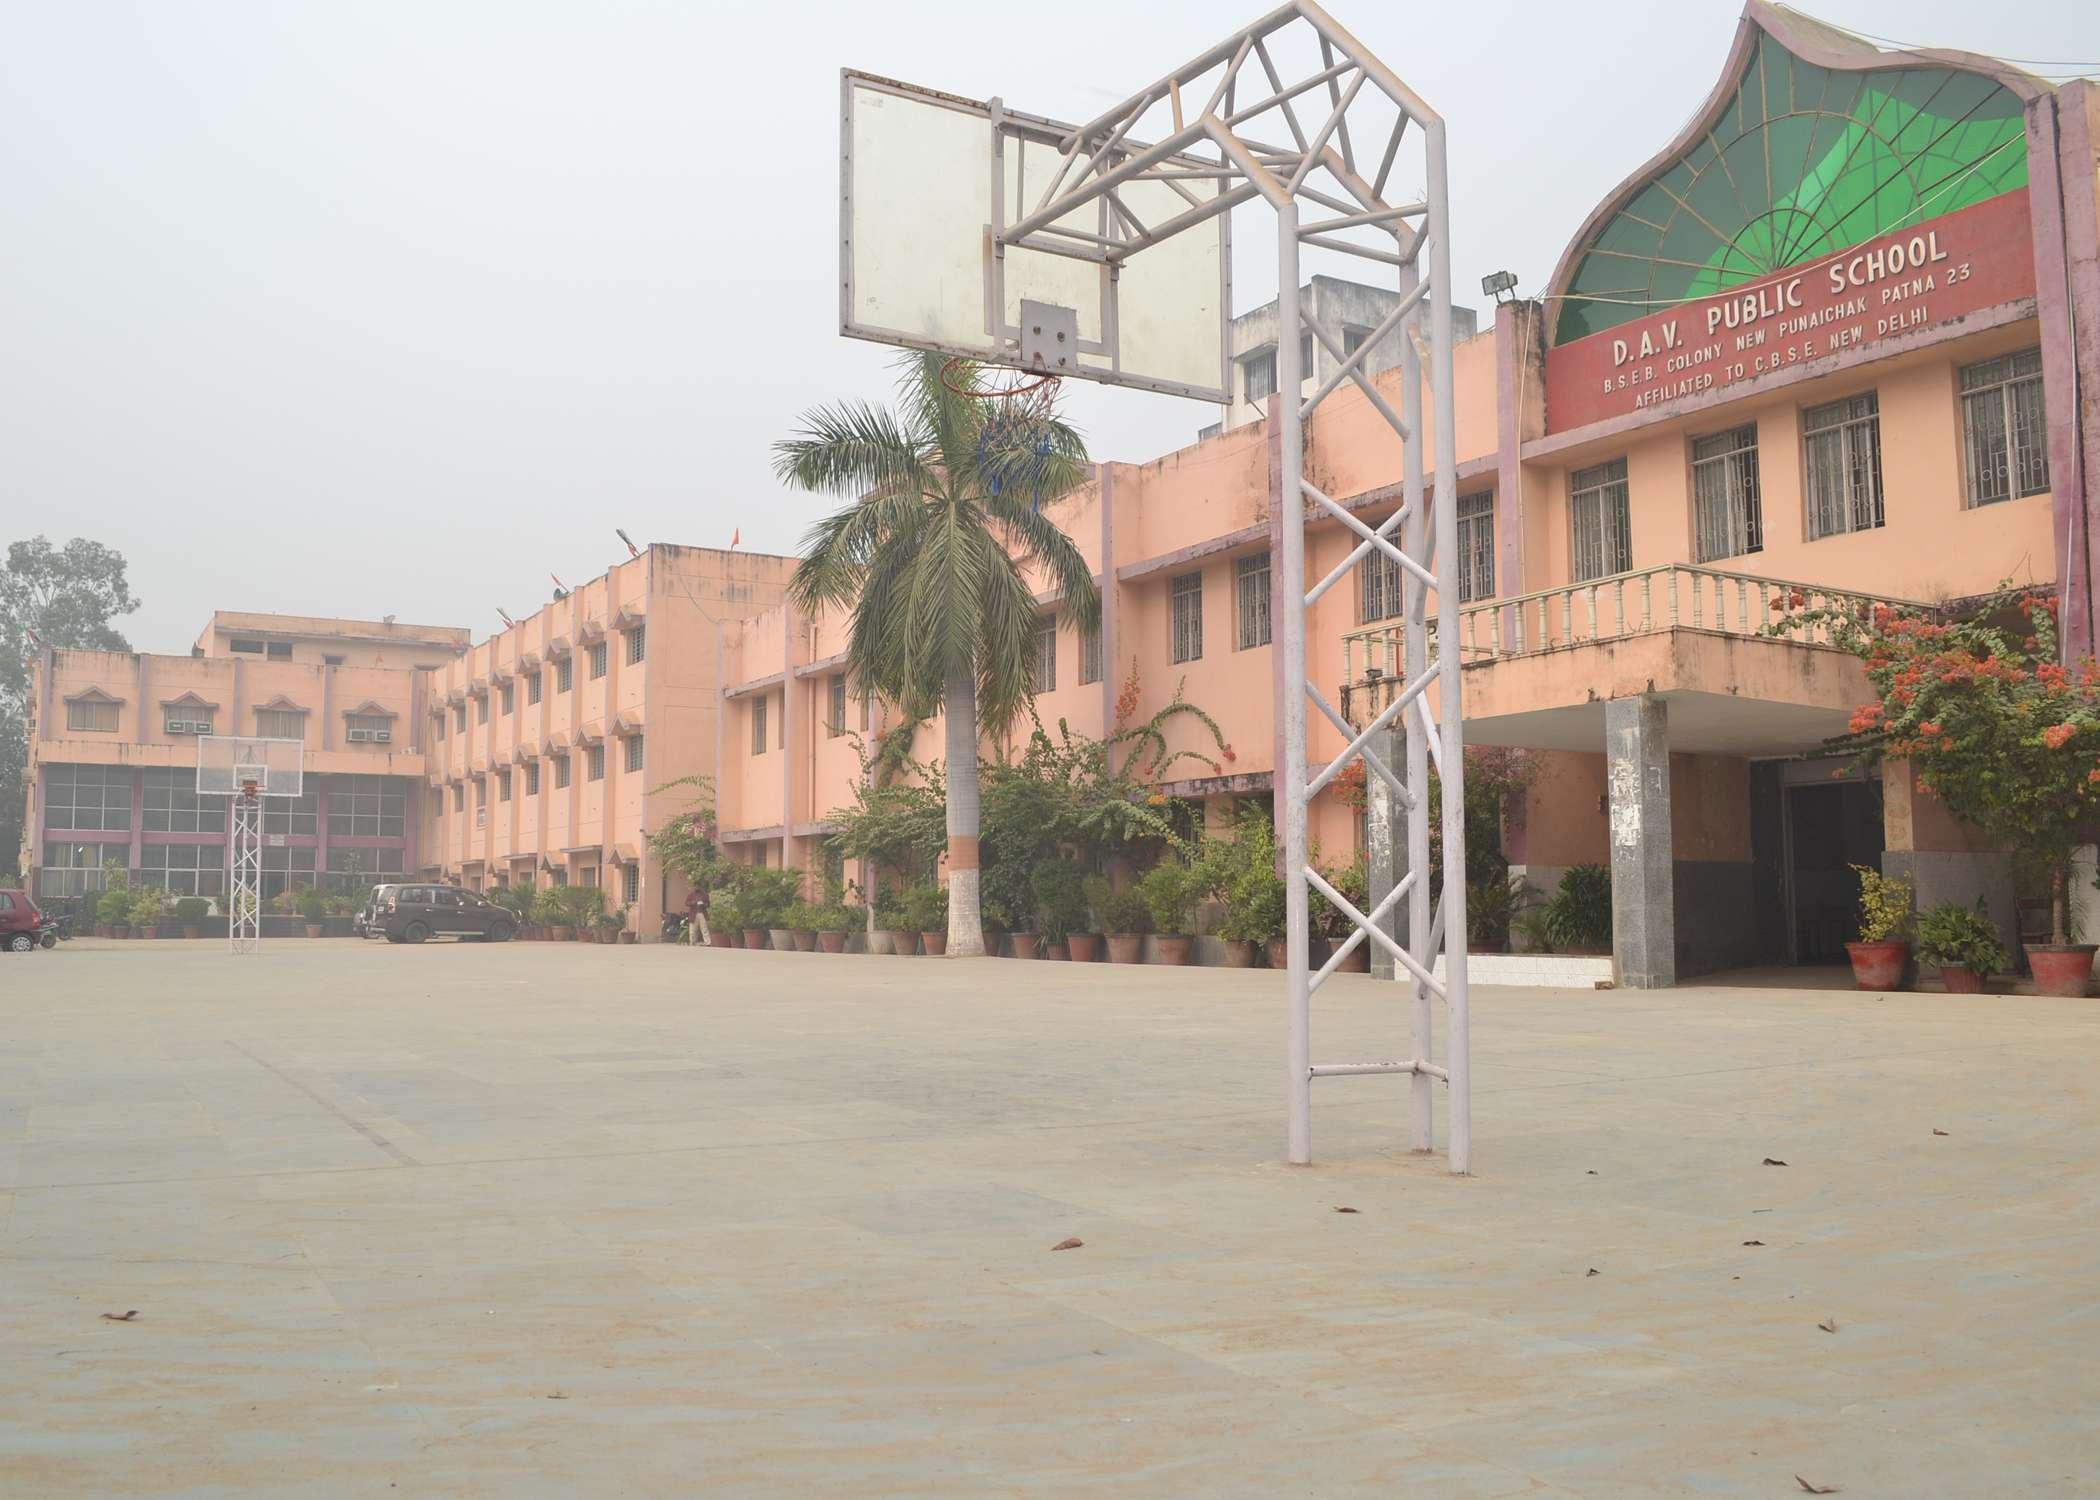 DAV PUBLIC SCHOOL BIHAR STATE ELECTRICITY BOARD NEW PUNAI CHAK PATNA BIHAR 330050